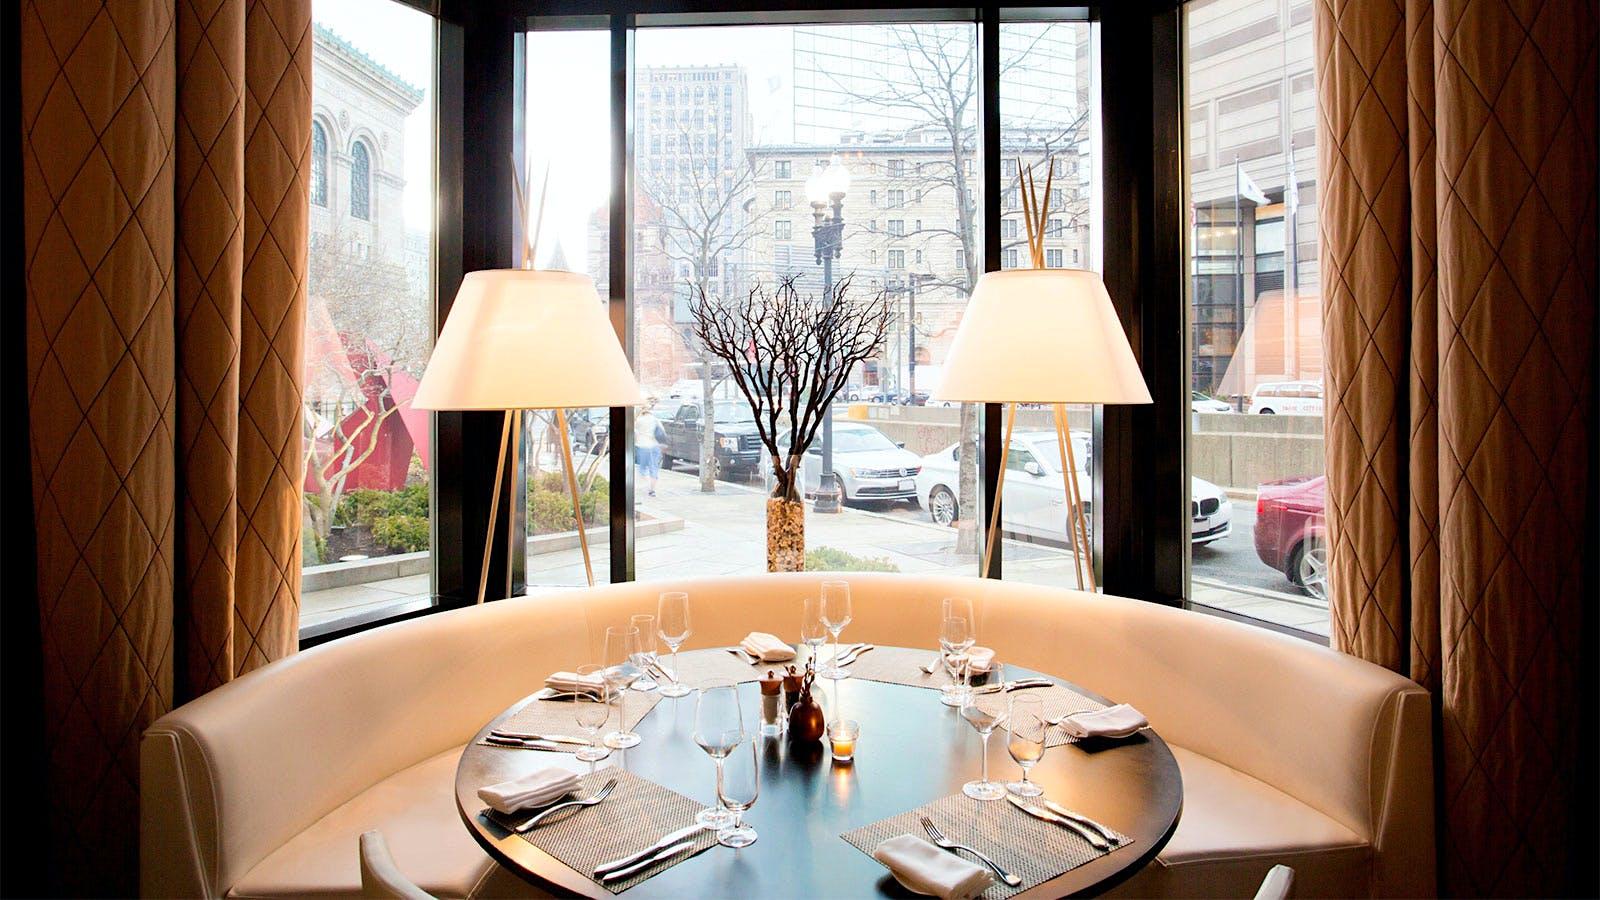 10 Winning Wine Restaurants in Boston